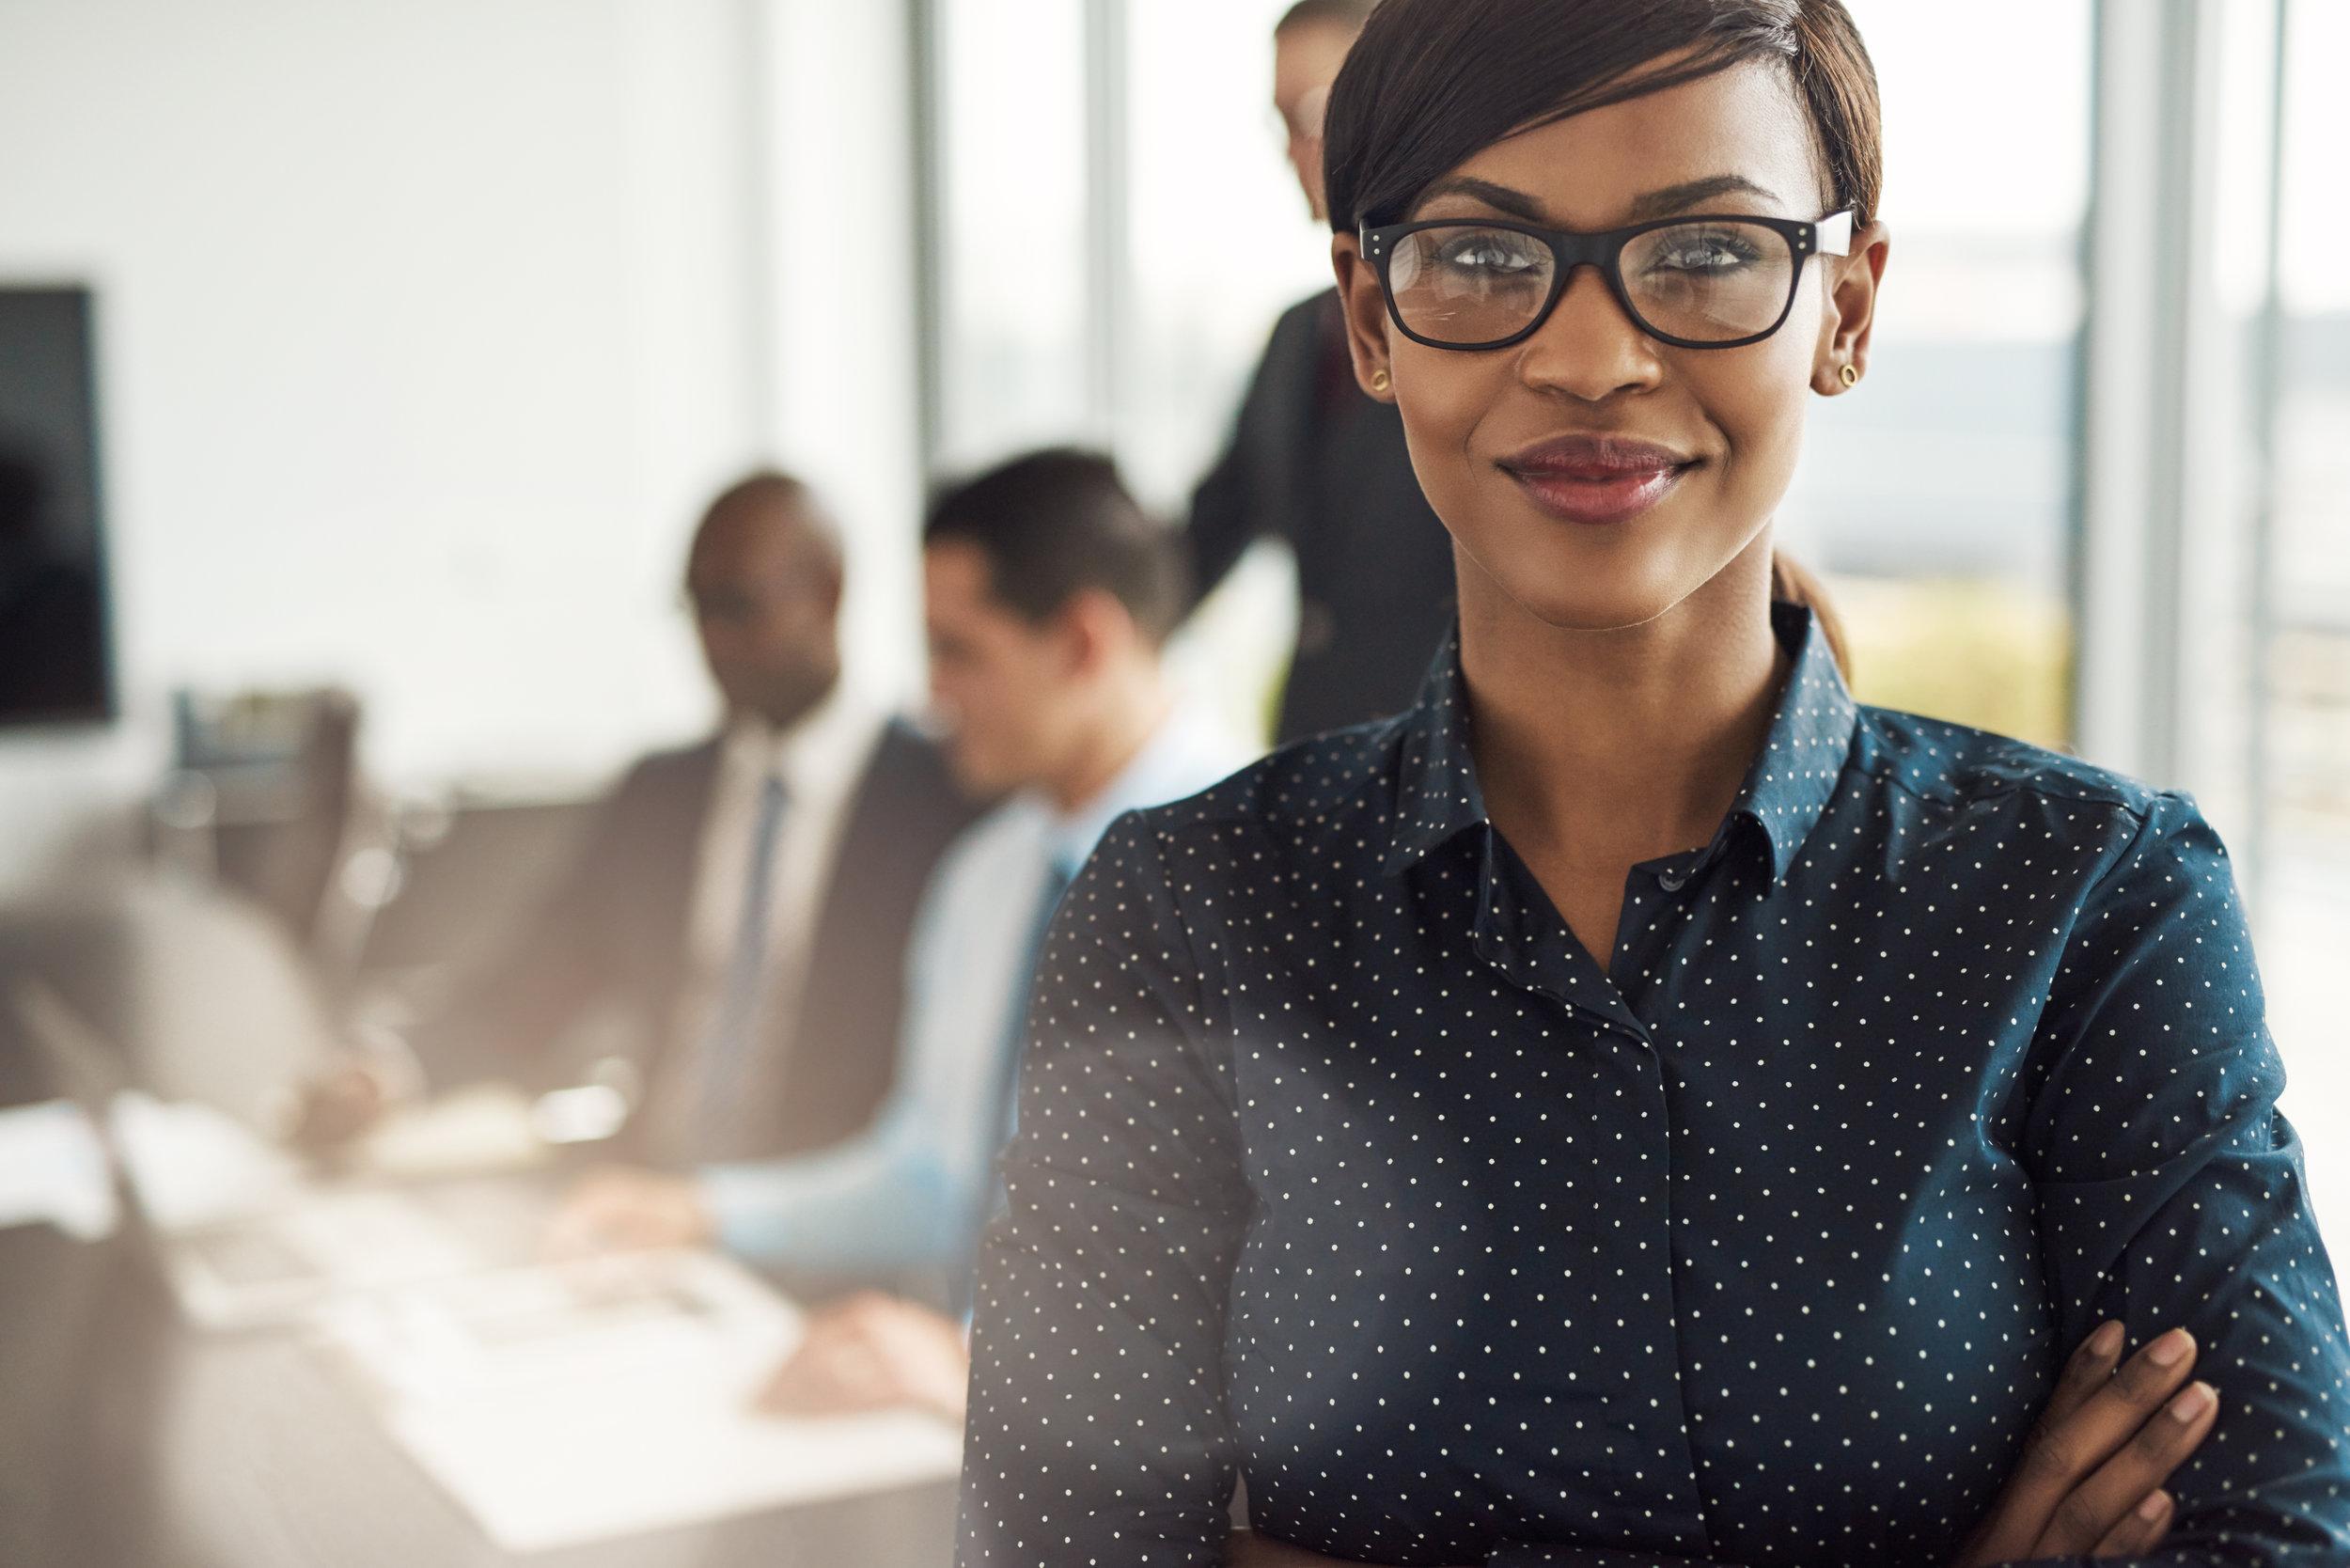 Krystal-Hicks-JobTalk-Career-advice 2.jpg